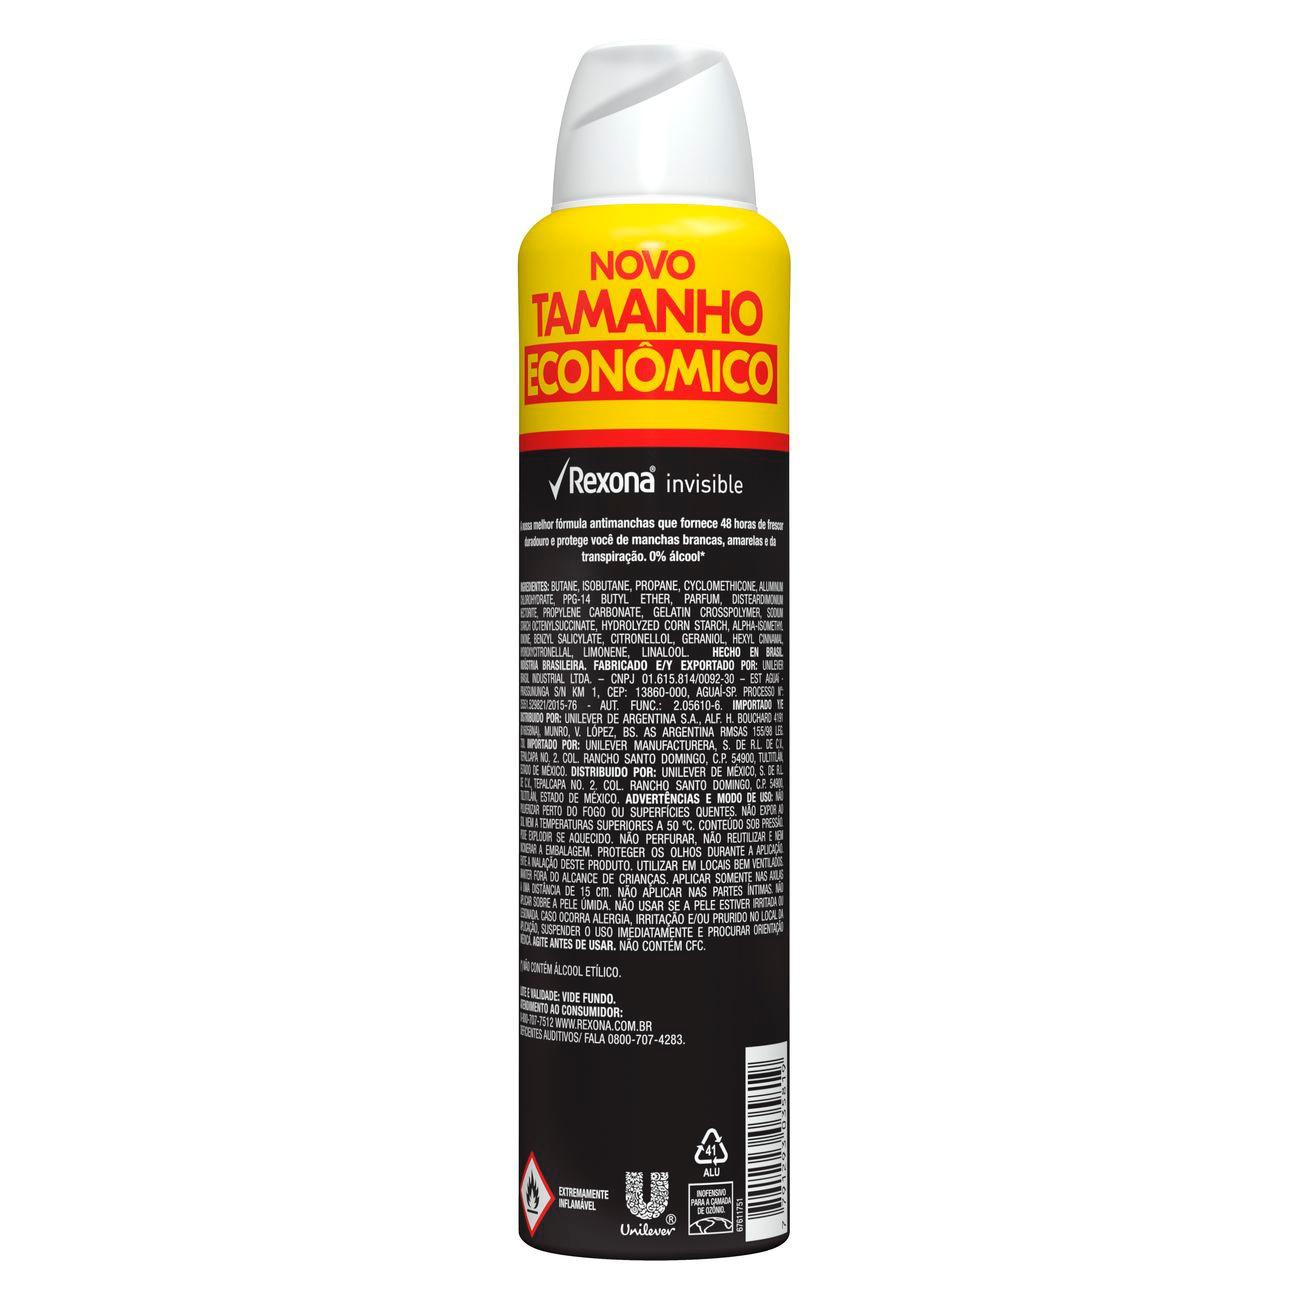 Desodorante Antitranspirante Aerosol Rexona Feminino Invisible 200ml | Caixa com 1